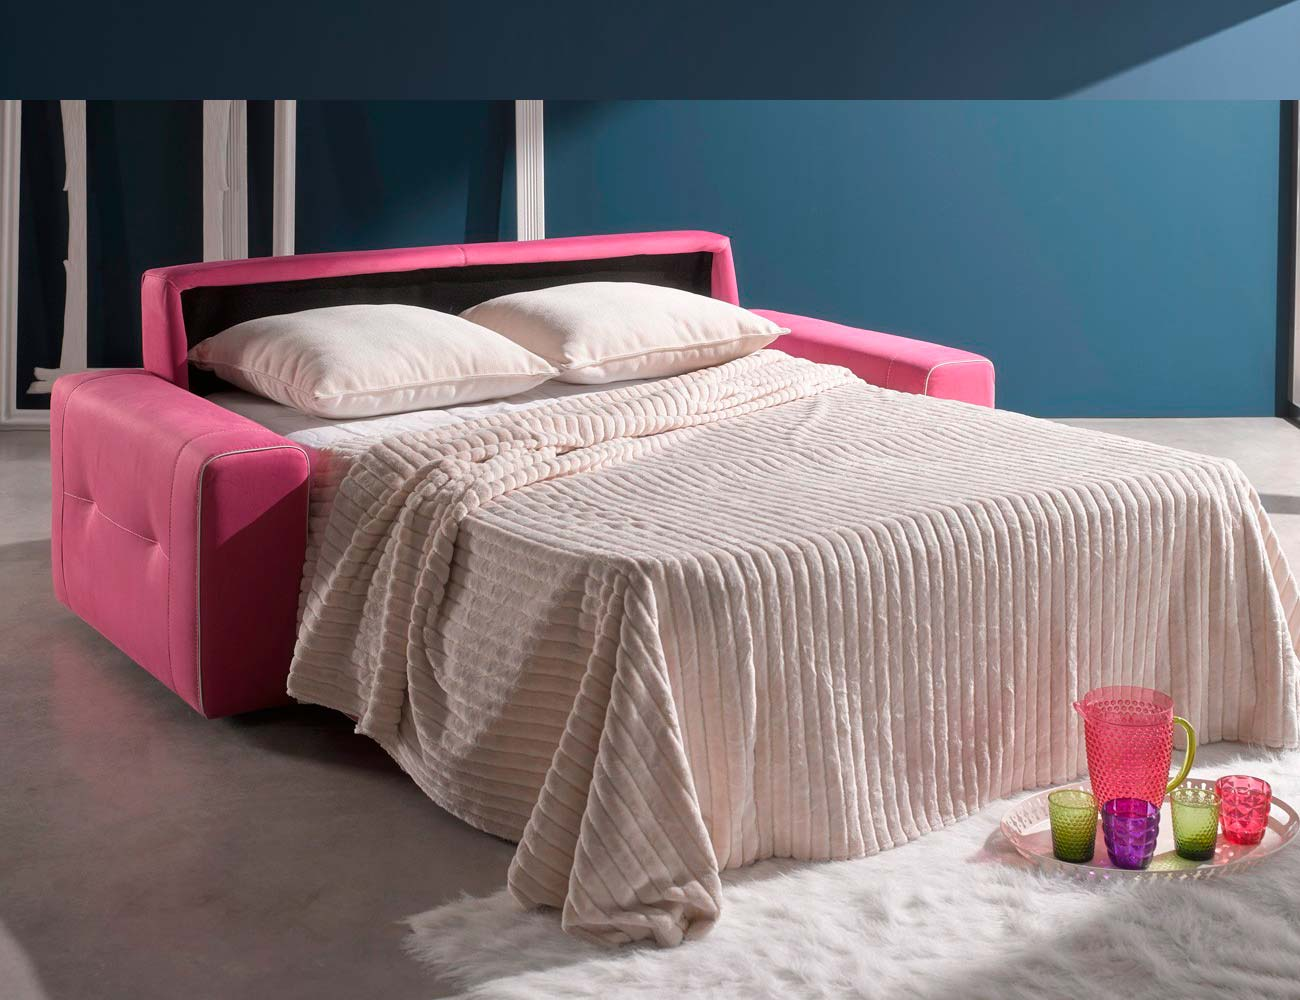 Sofa cama pedro ortiz apertura italiana